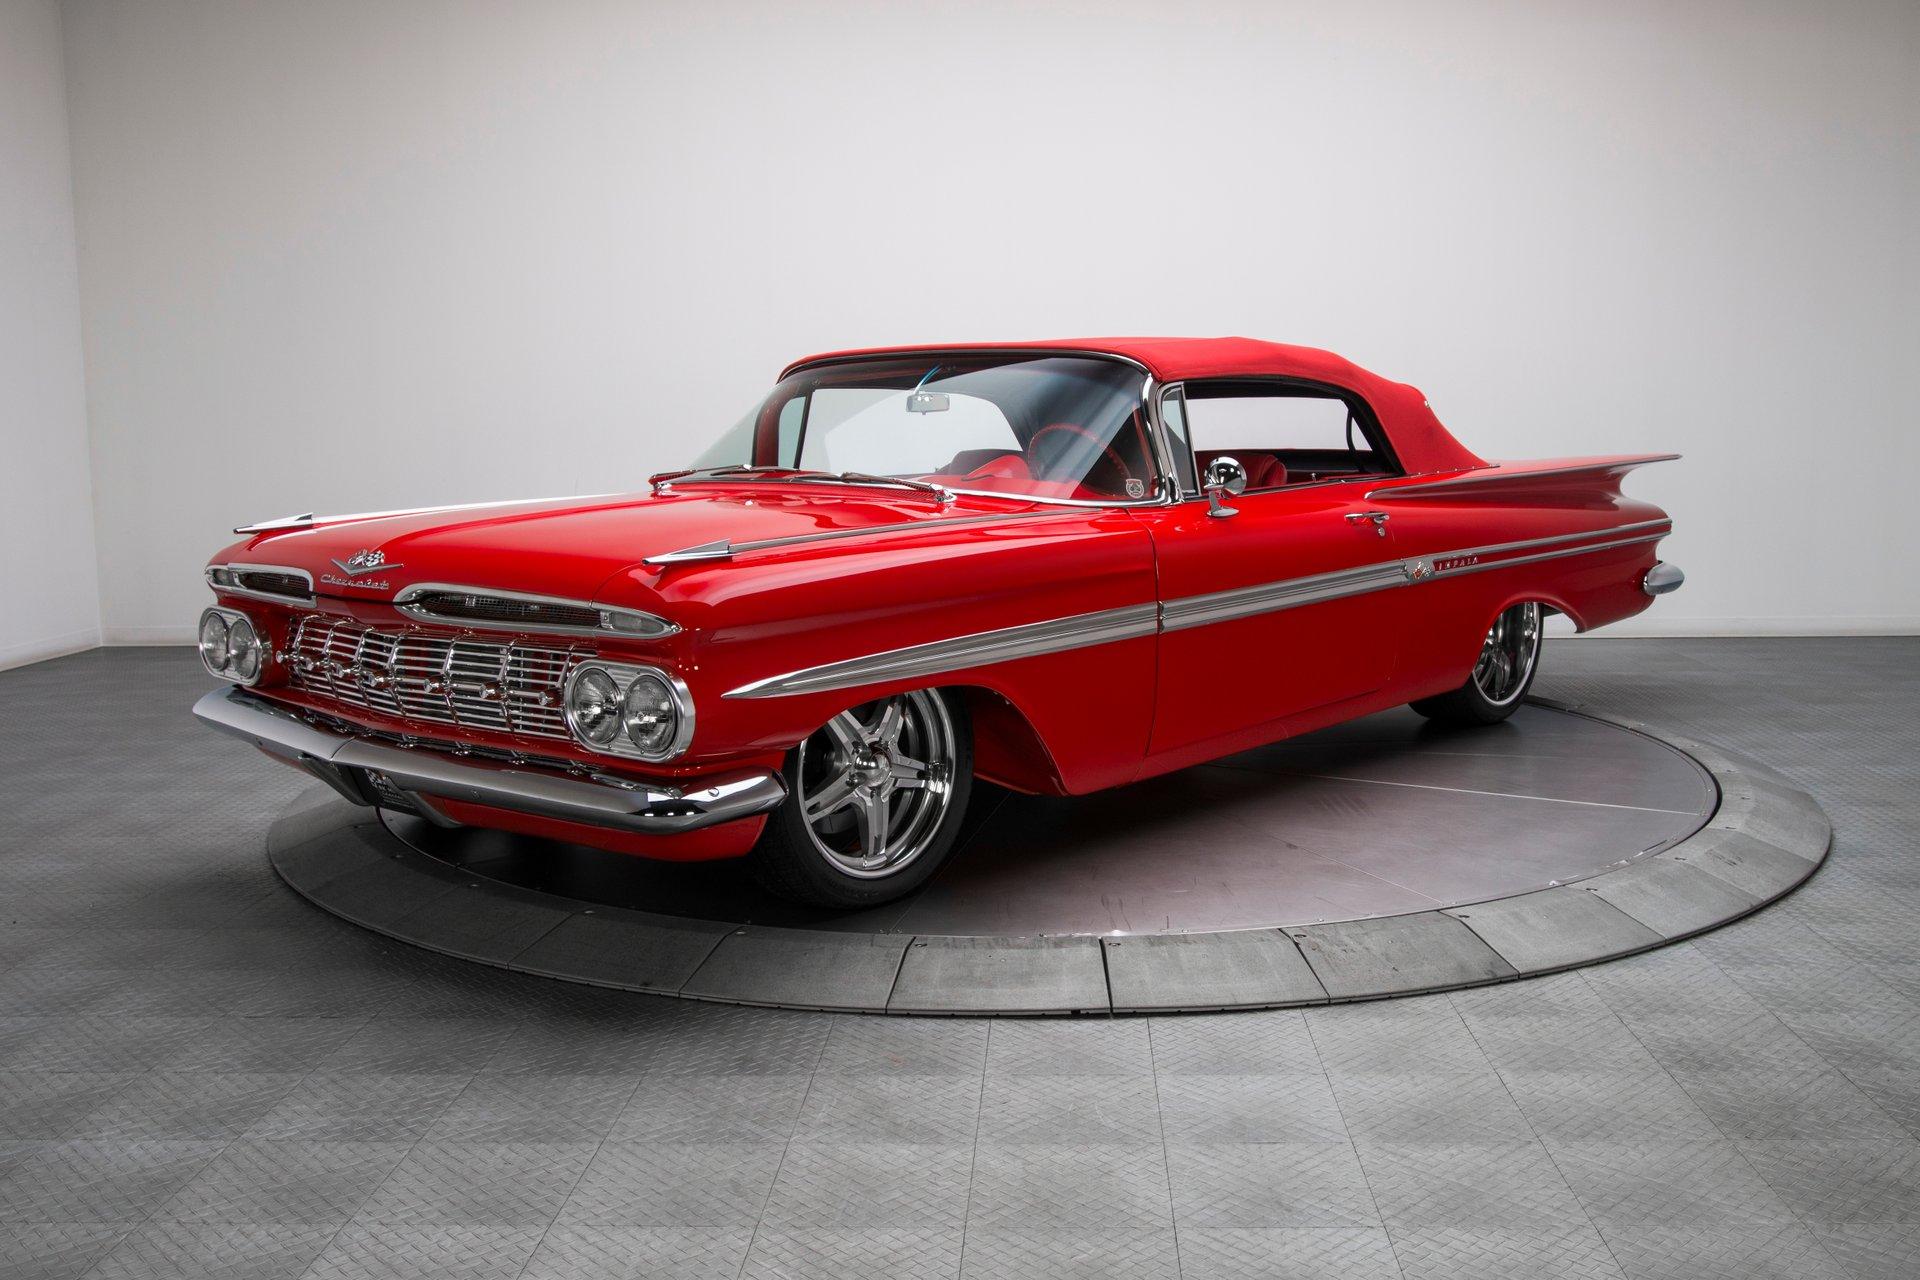 135368 1959 Chevrolet Impala RK Motors Classic Cars for Sale